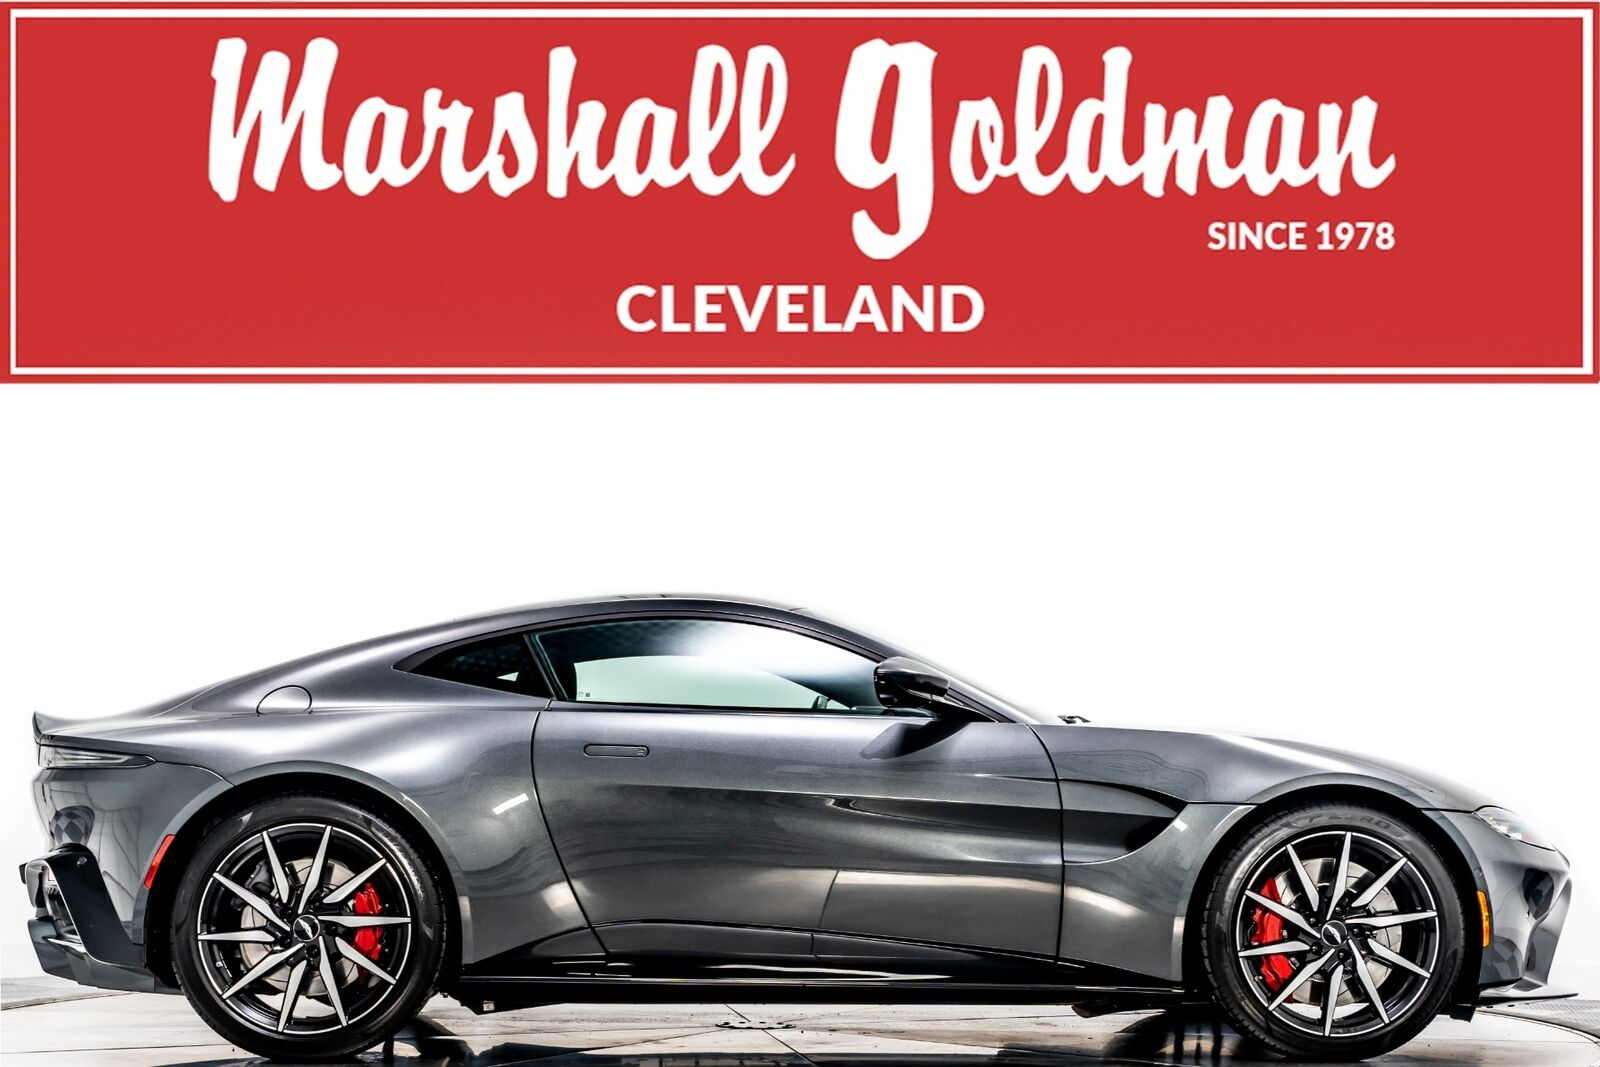 2020 Aston Martin Vantage  Coupe 4.0L Twin Turbo V8 503hp 505ft. lbs. 8-Speed Au